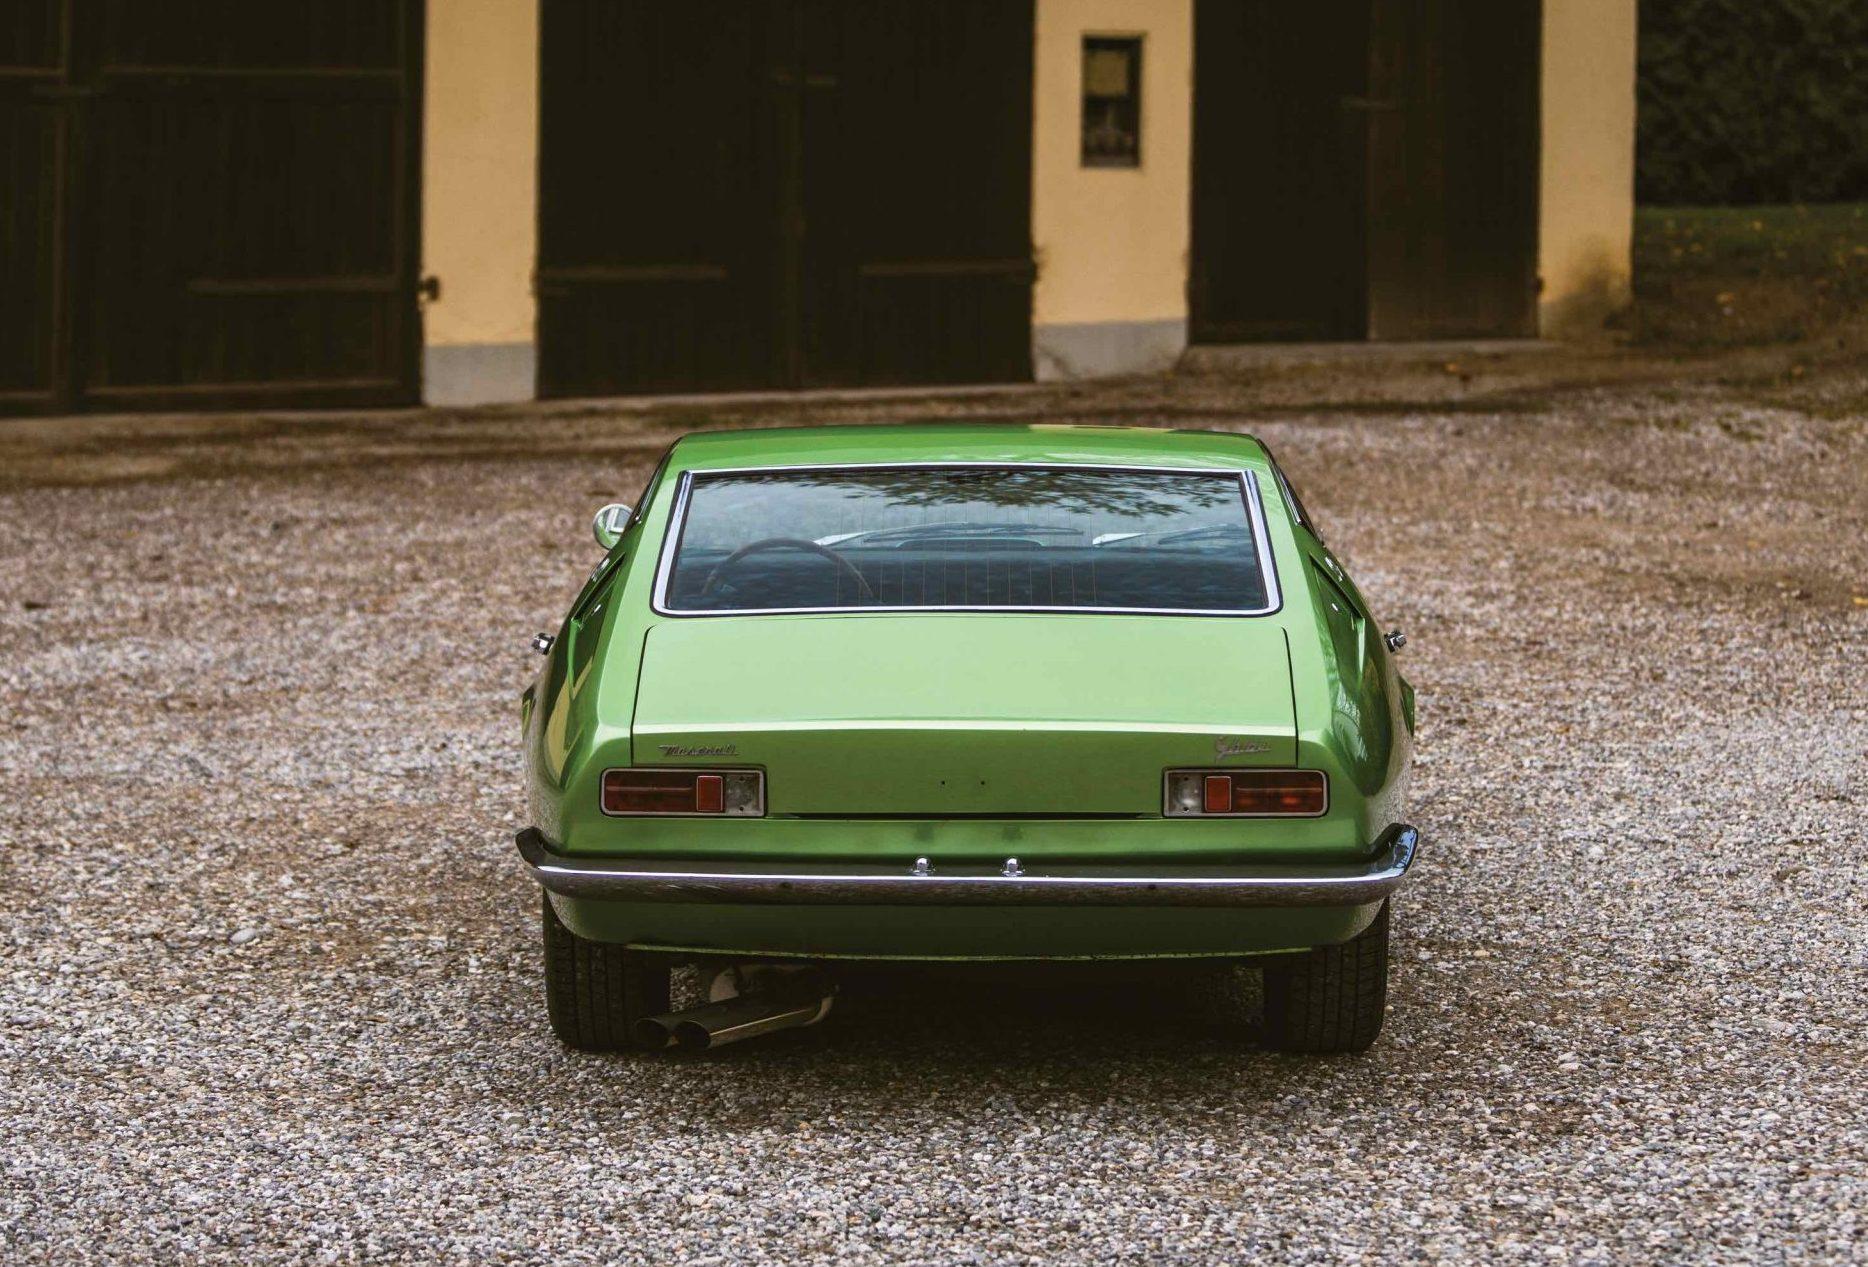 Maserati-Ghibli rear